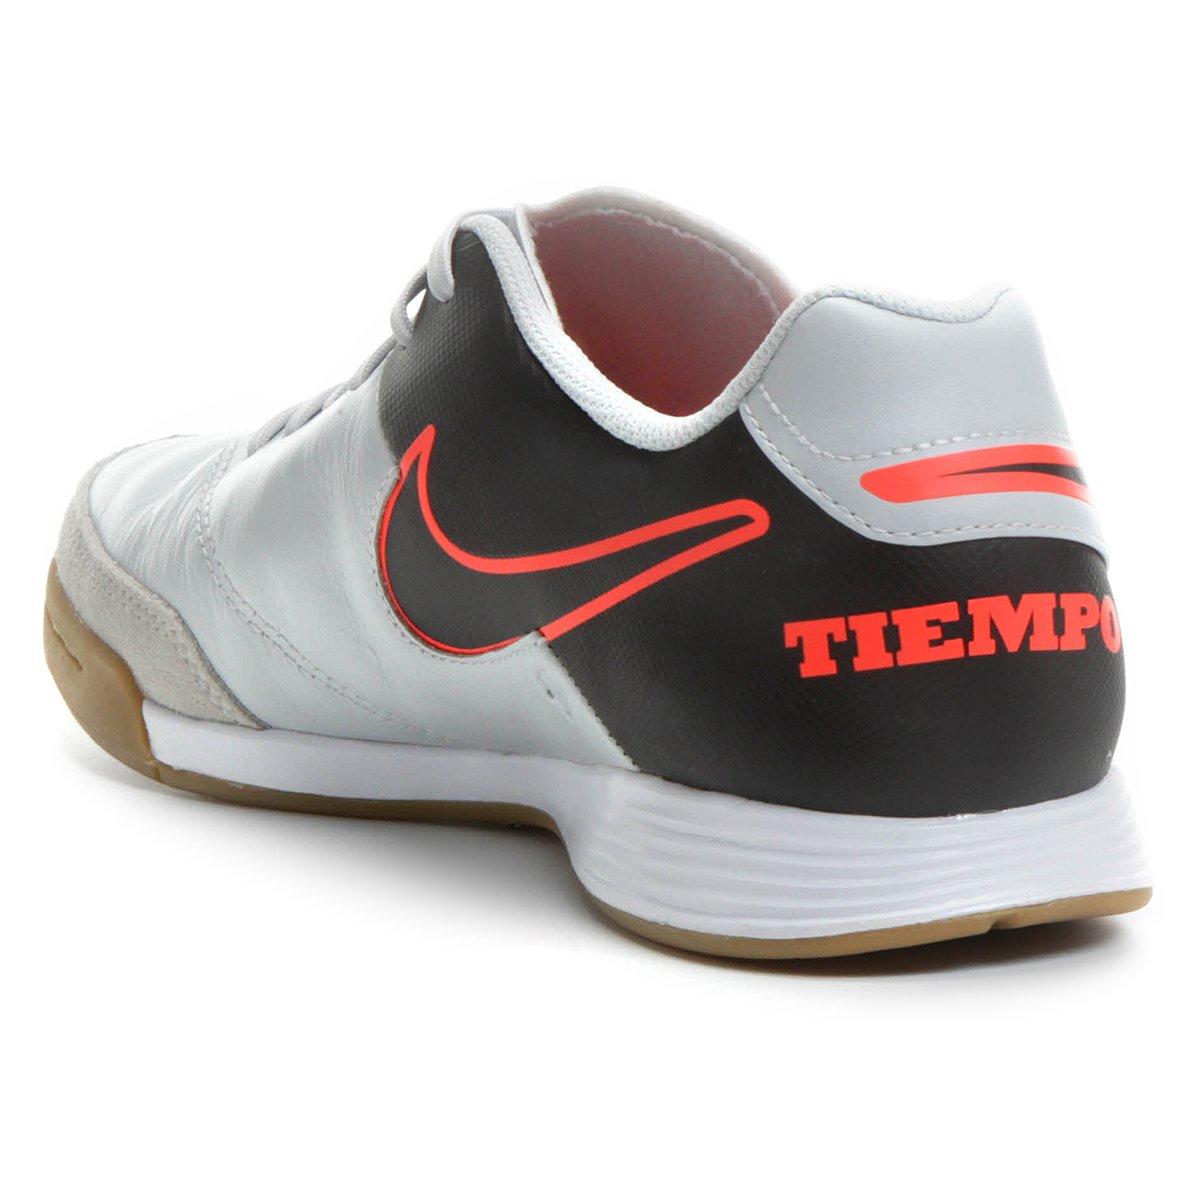 902f782199 Chuteira Futsal Nike Tiempo Genio 2 Leather IC Masculina - Compre ...